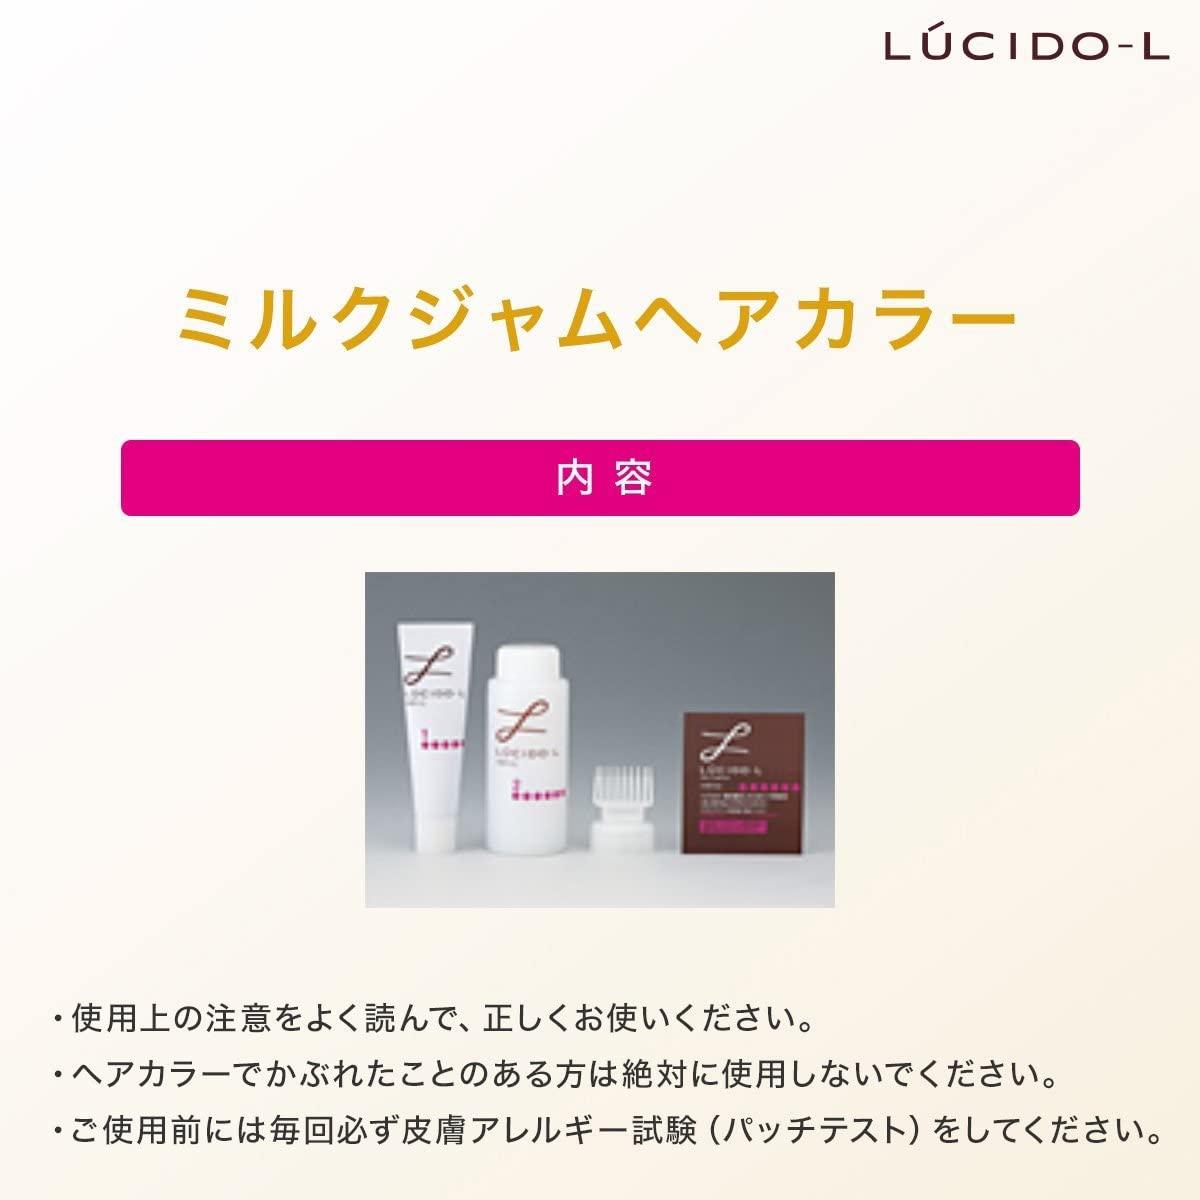 LUCIDO-L(ルシードエル) ミルクジャムヘアカラーの商品画像2